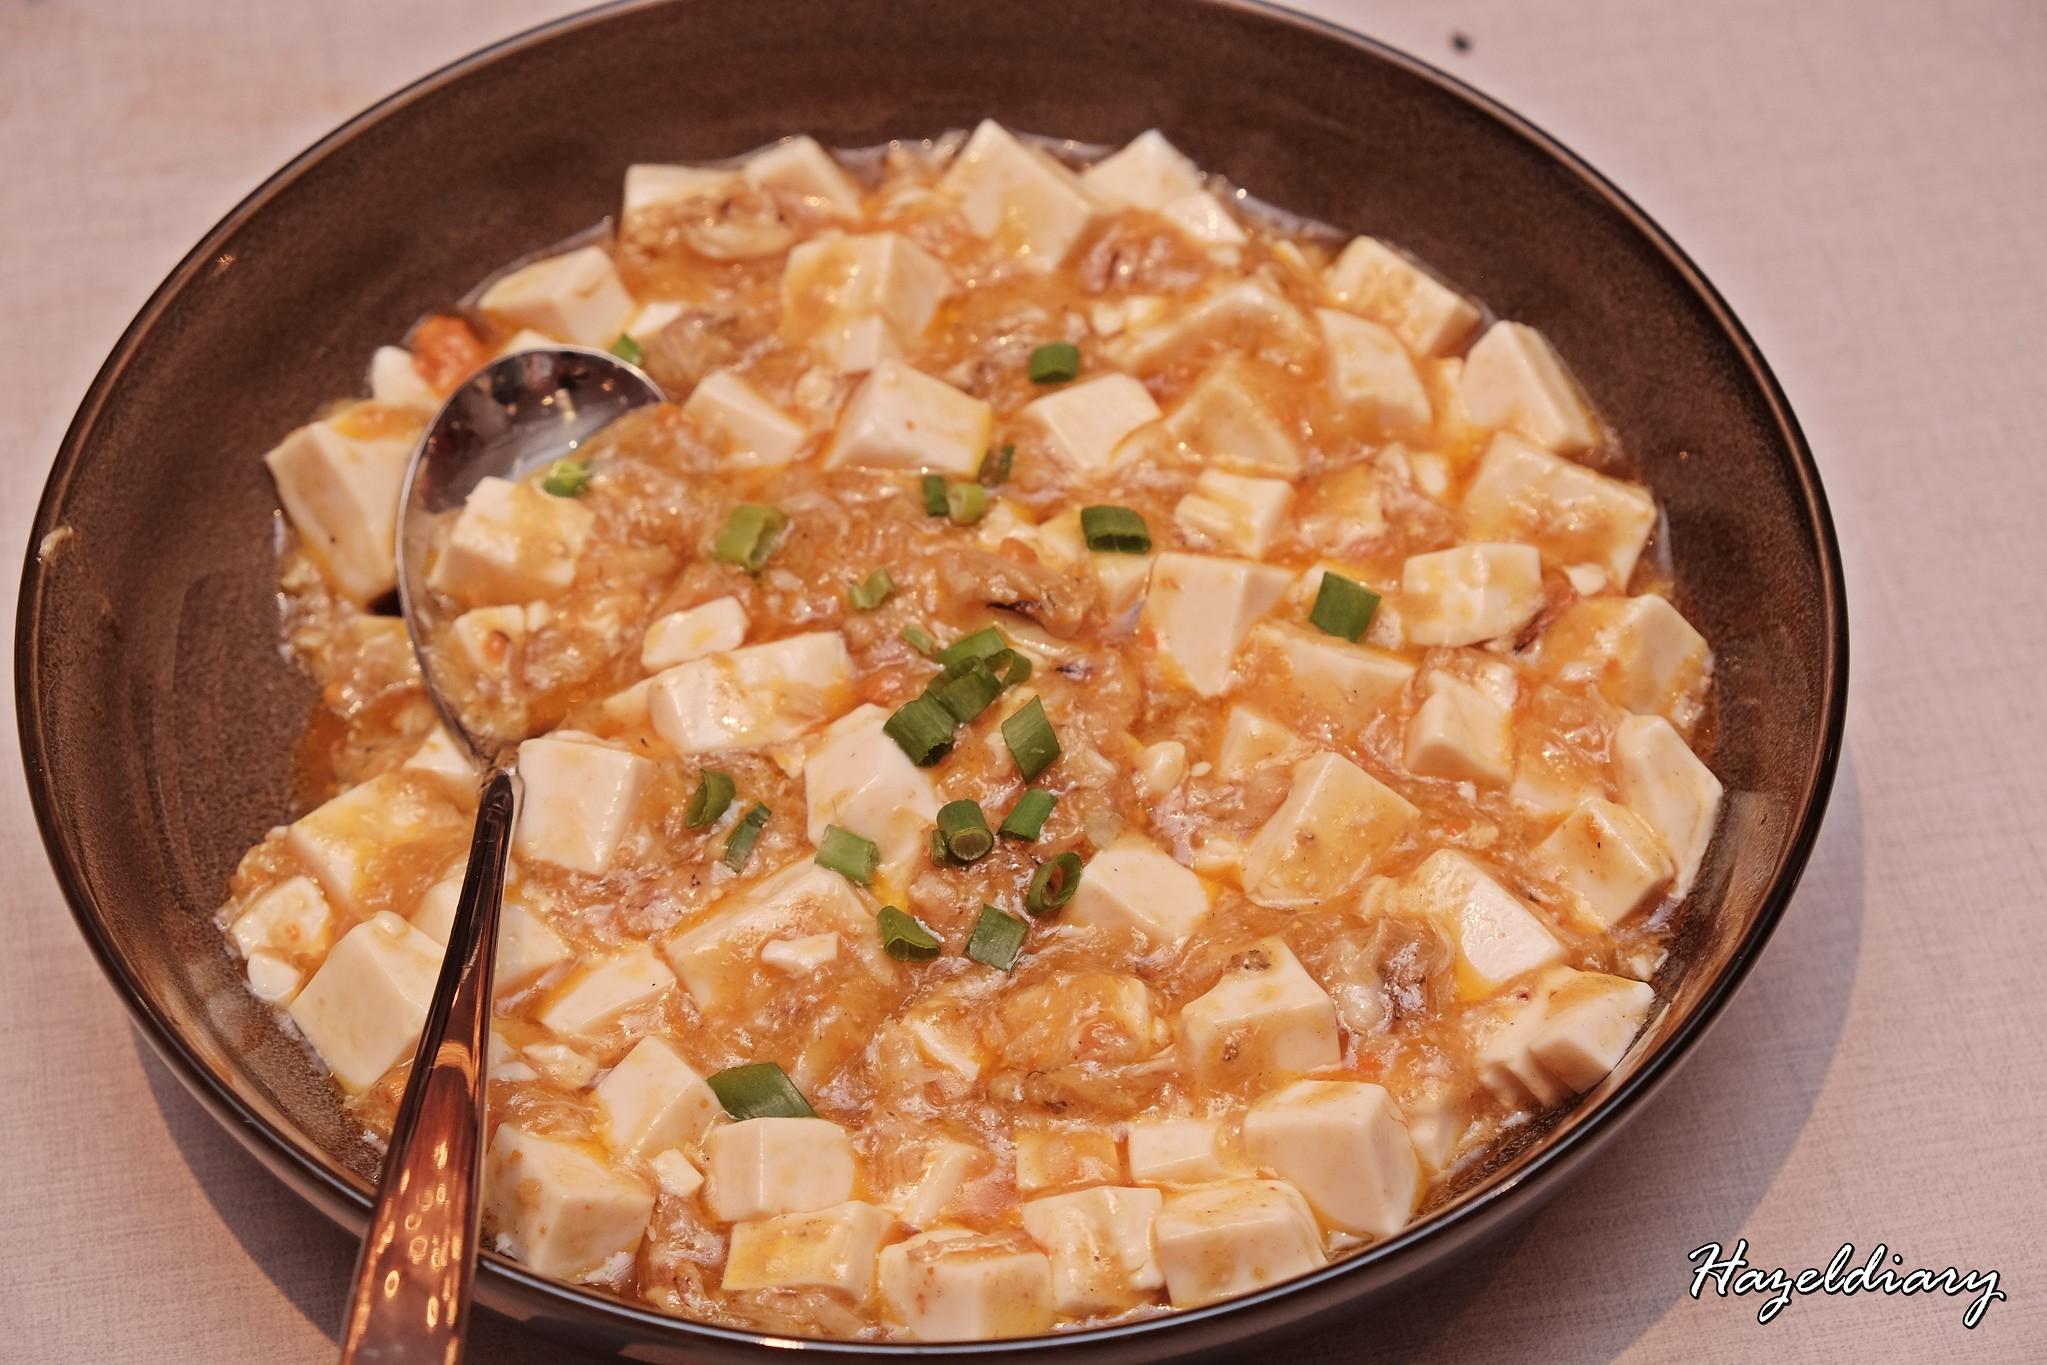 Paradise Dynasty-Wisma Atria-Braised Tofu with Crab Roe